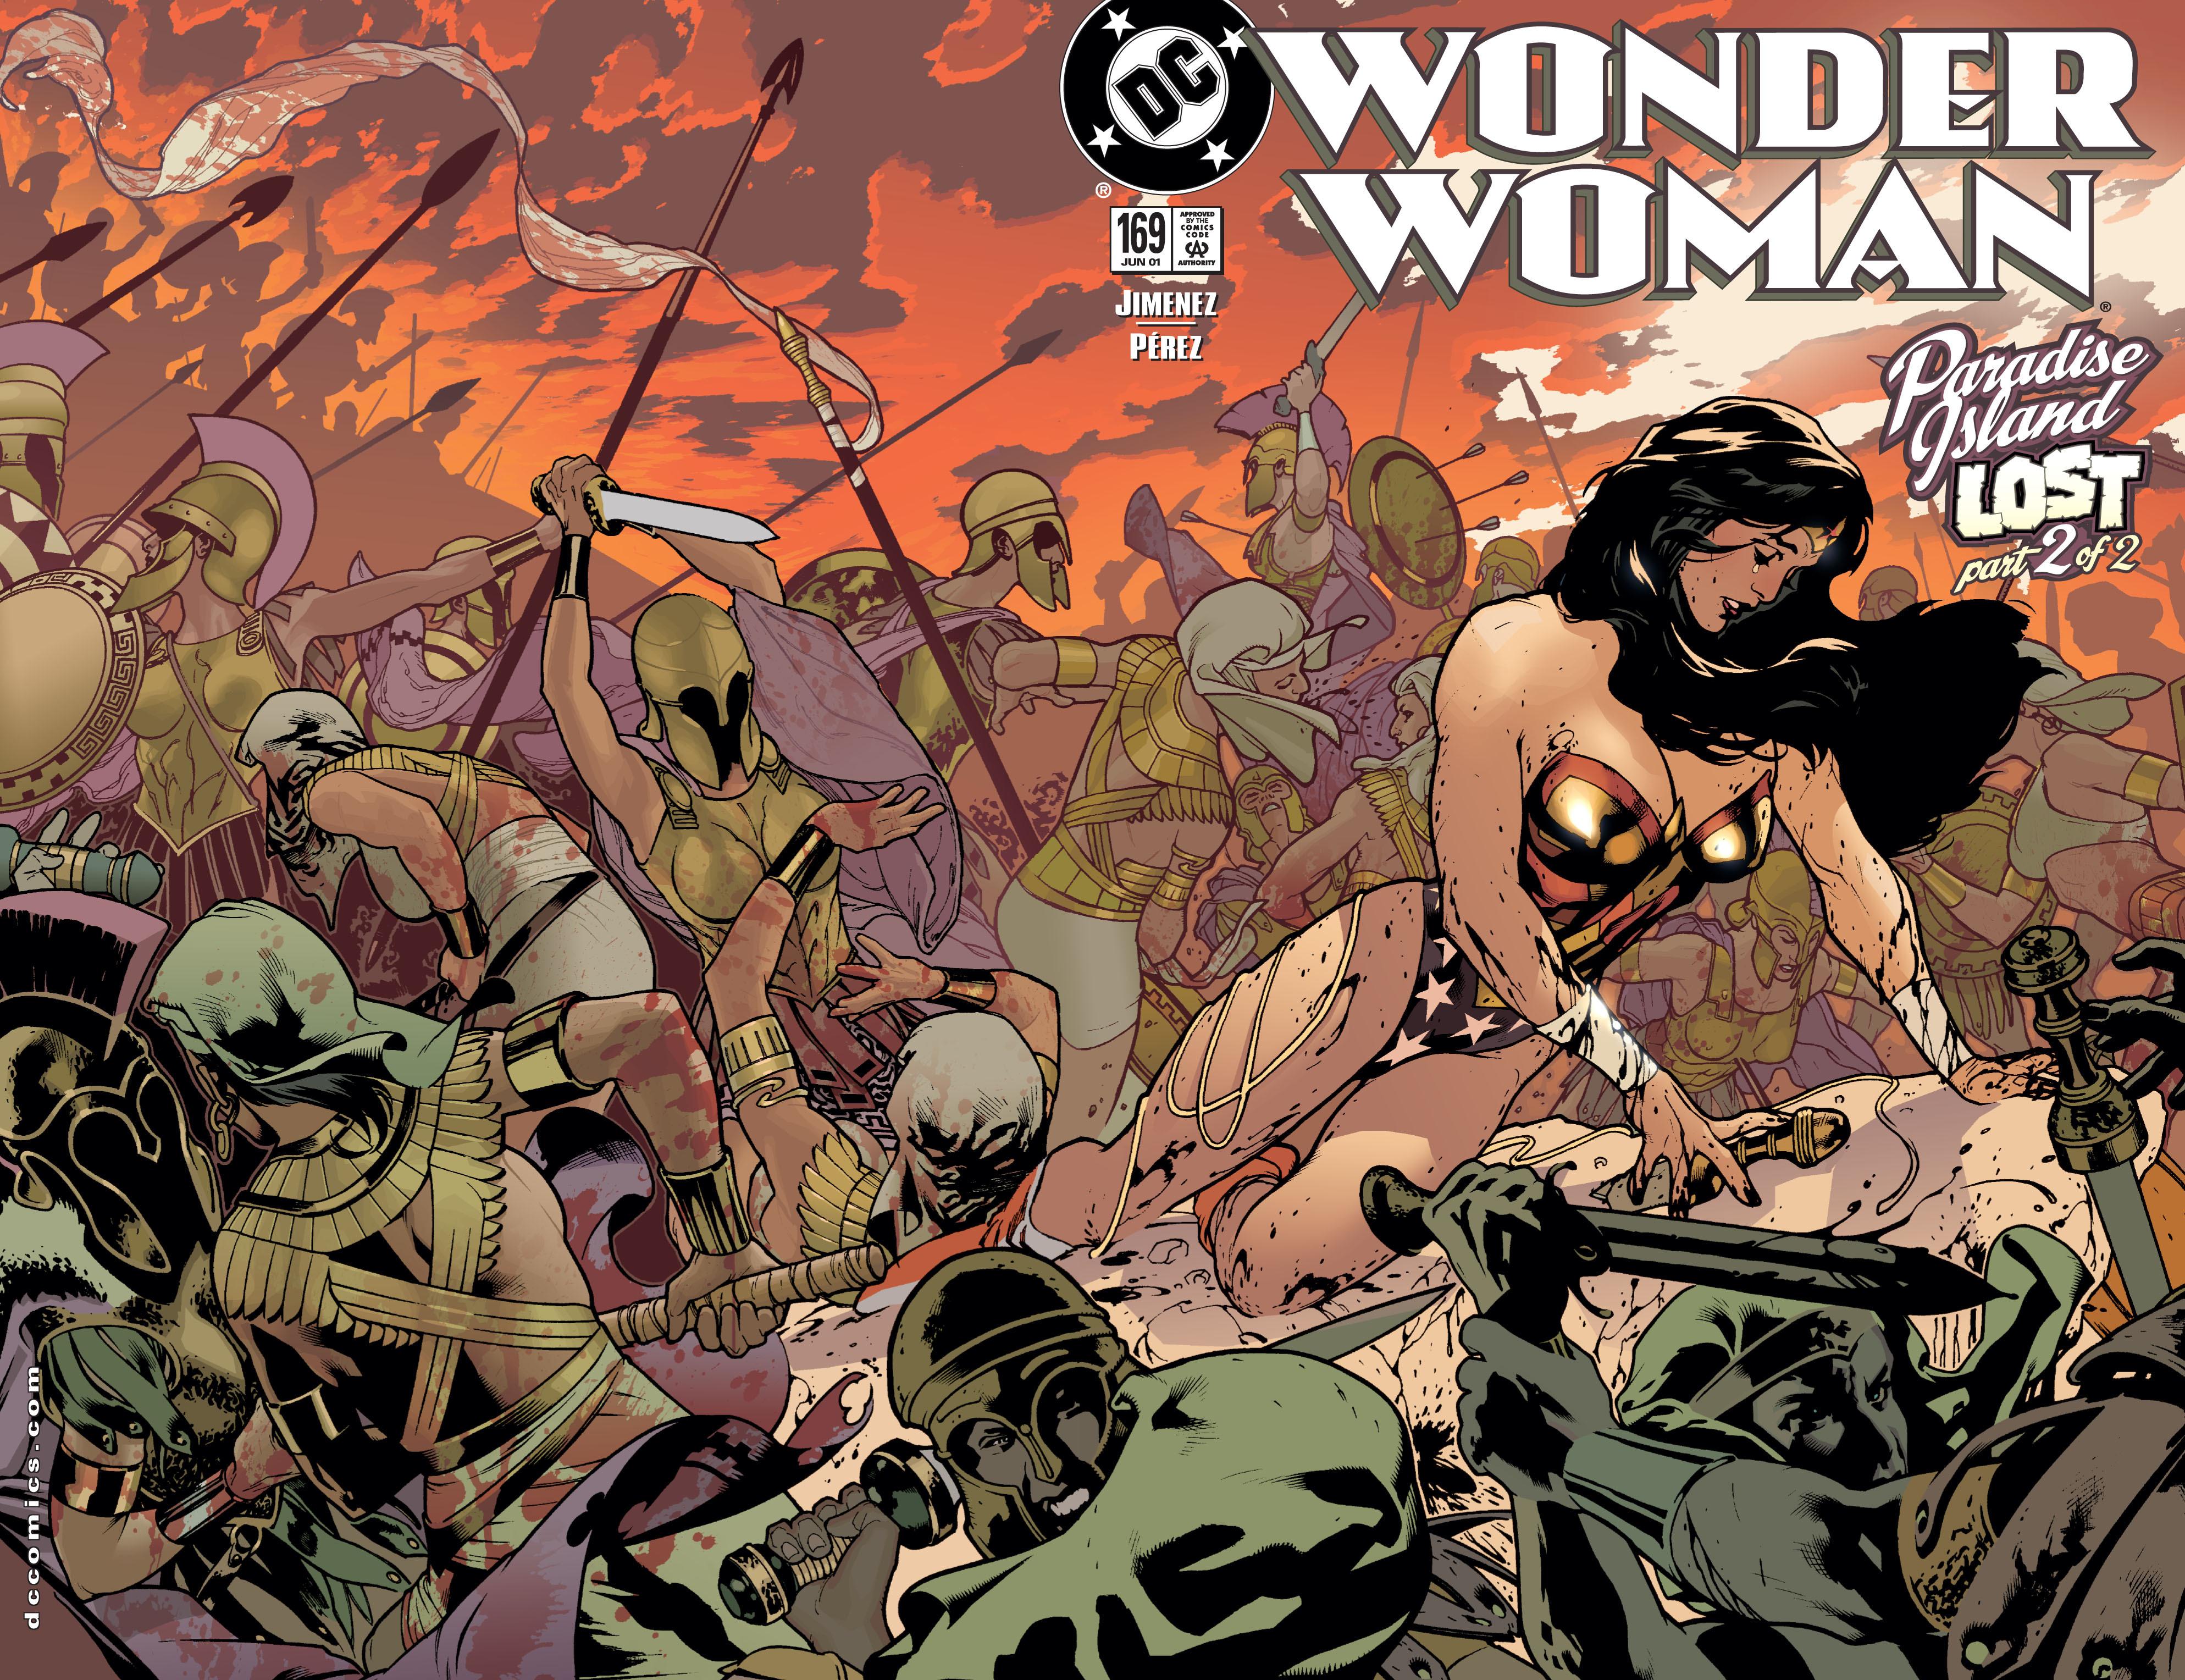 Read online Wonder Woman (1987) comic -  Issue #169 - 2